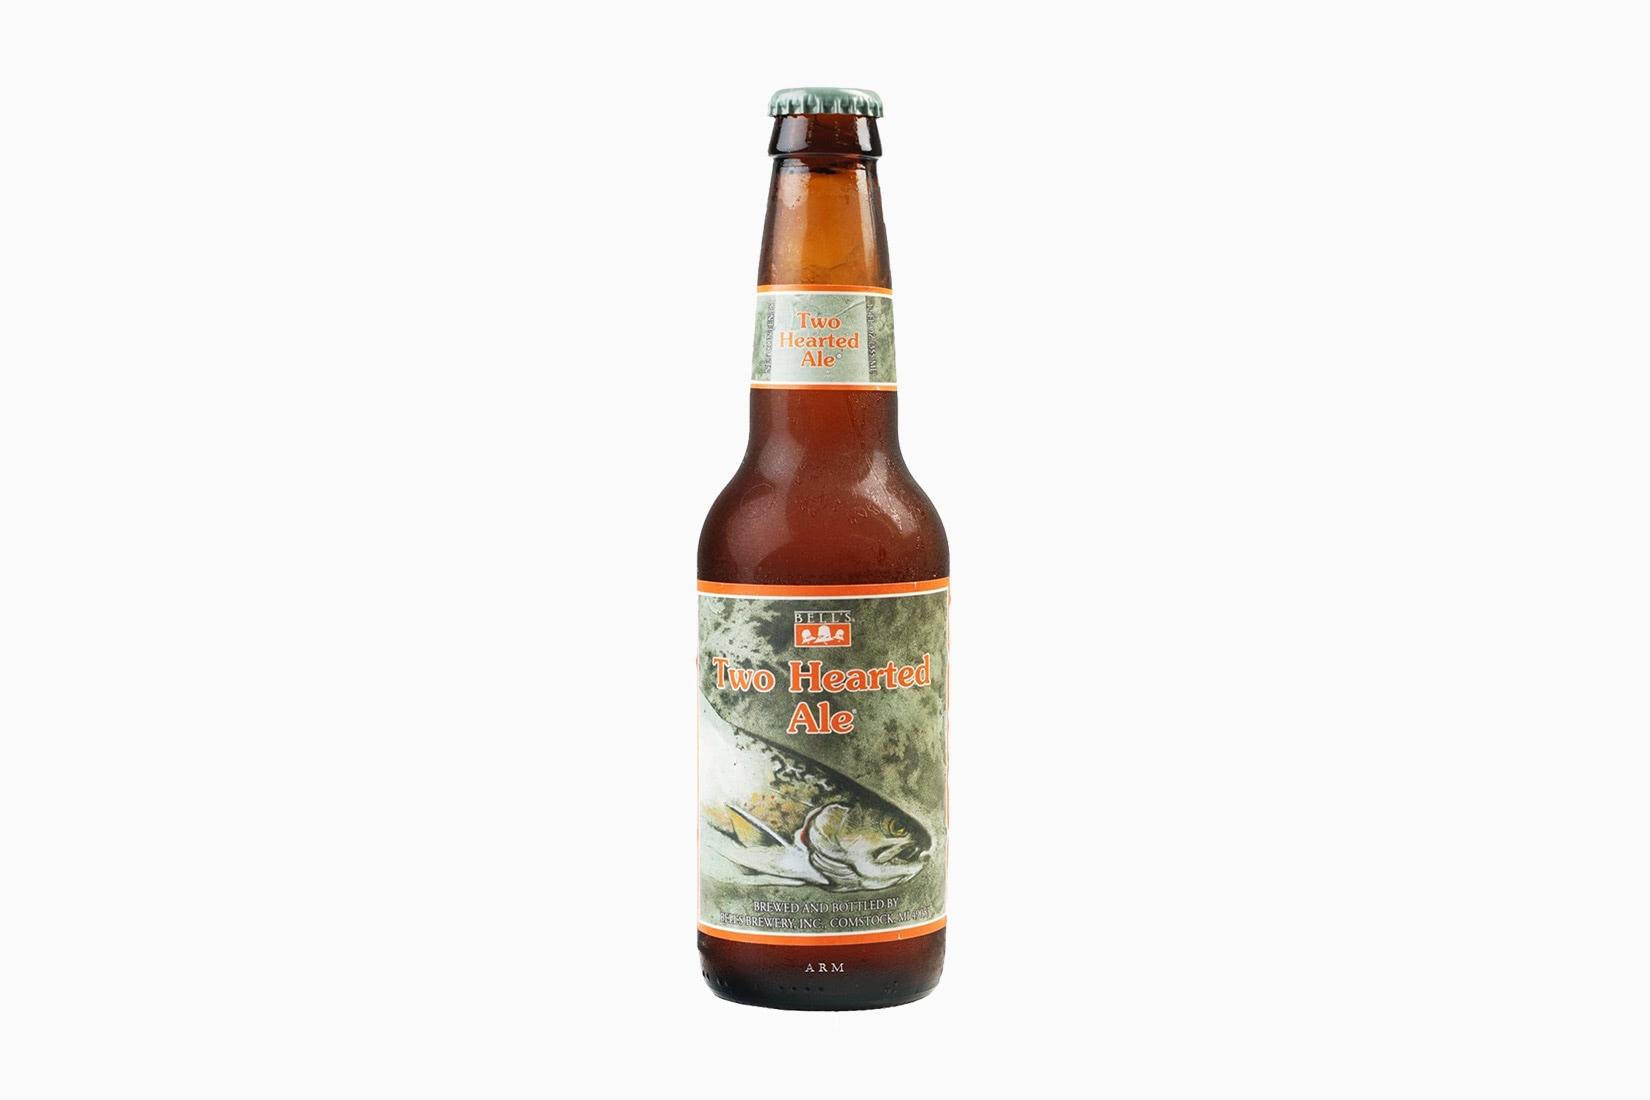 best beer brands two hearted ipa - Luxe Digital